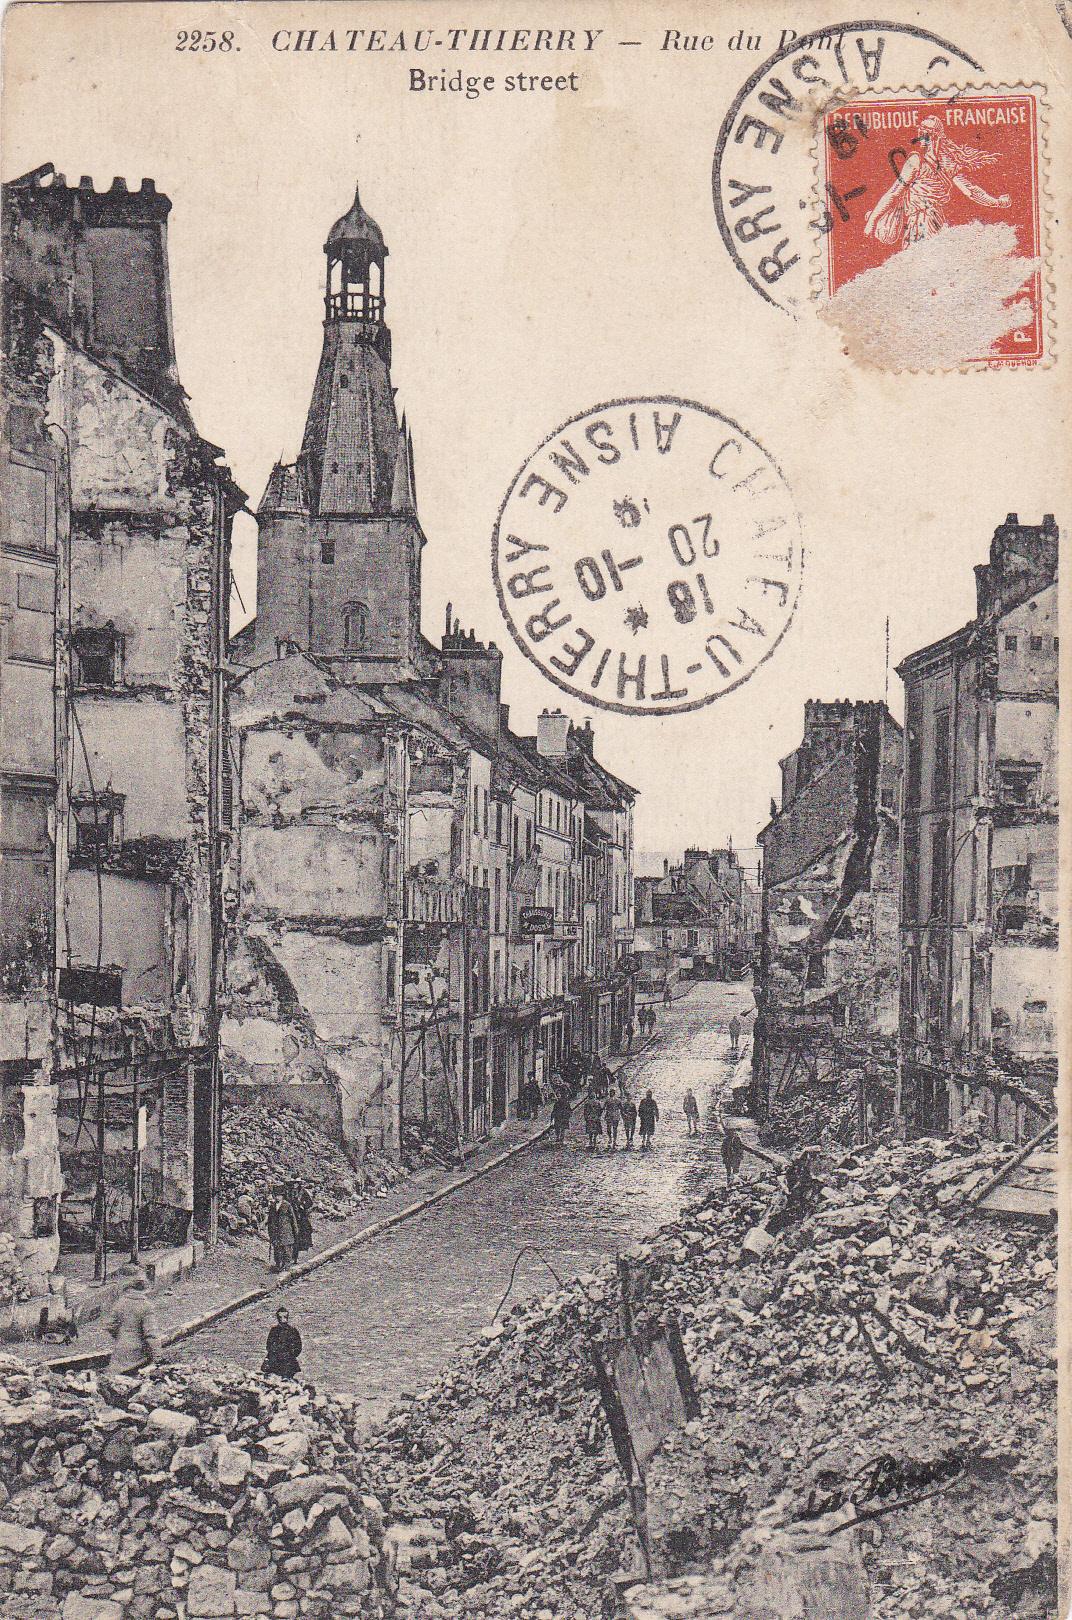 02. Chateau Thierry 1.jpg